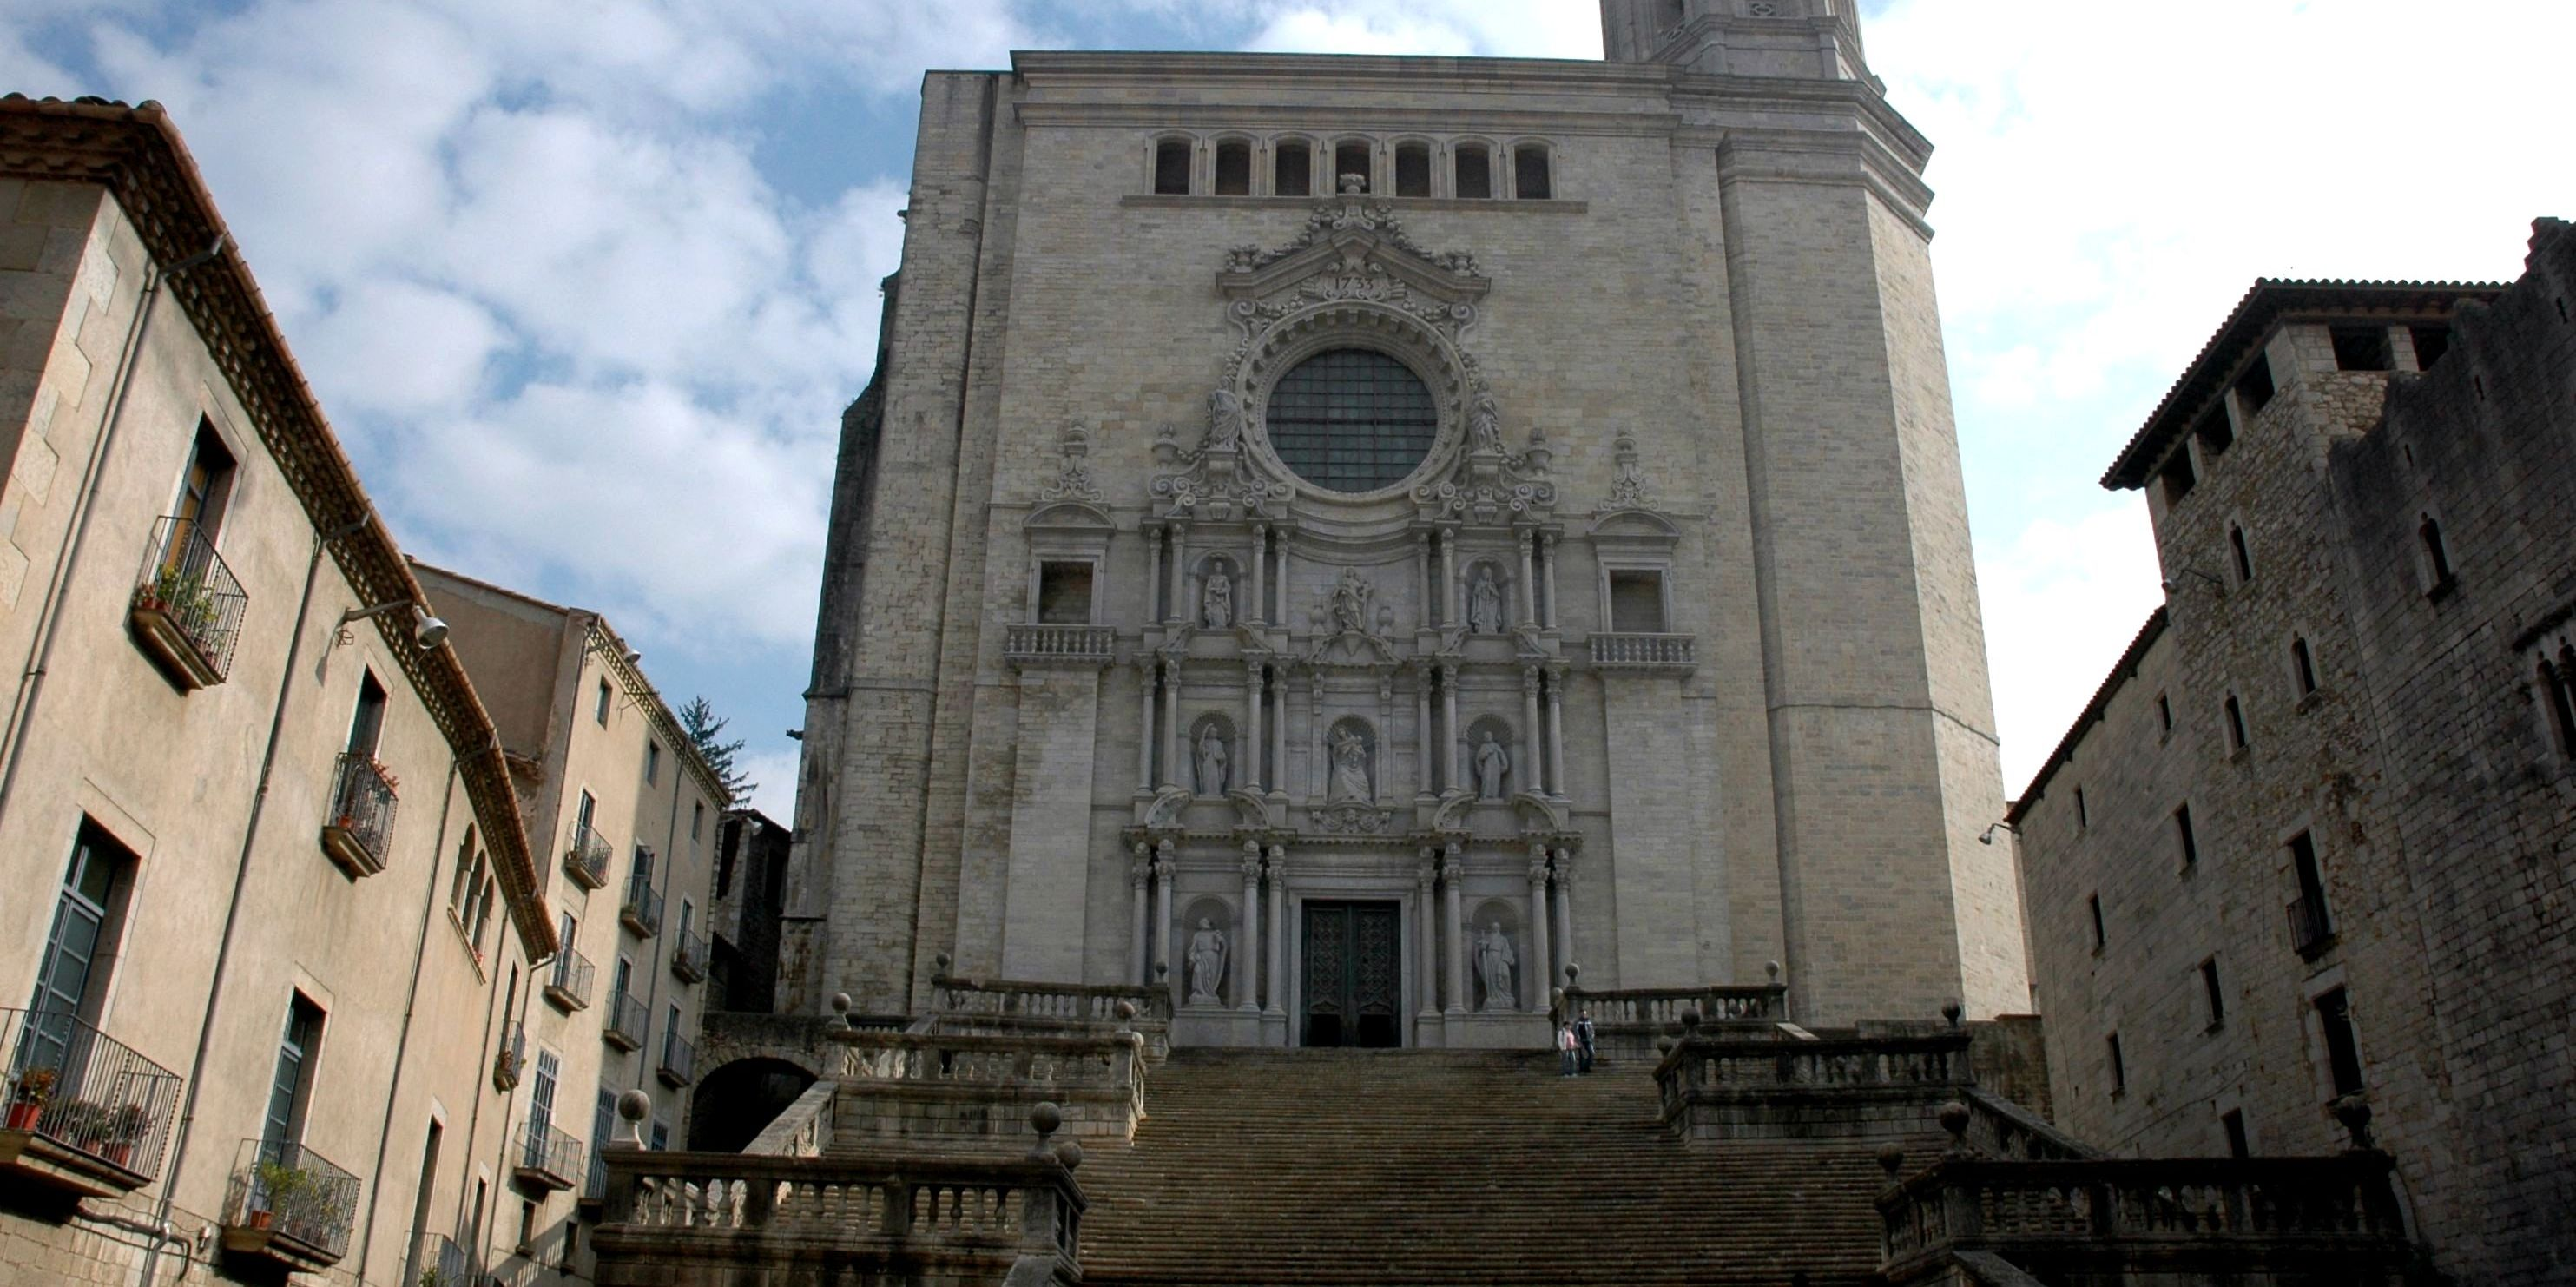 Sortint des de Girona: visita ciutat + Museu Dalí